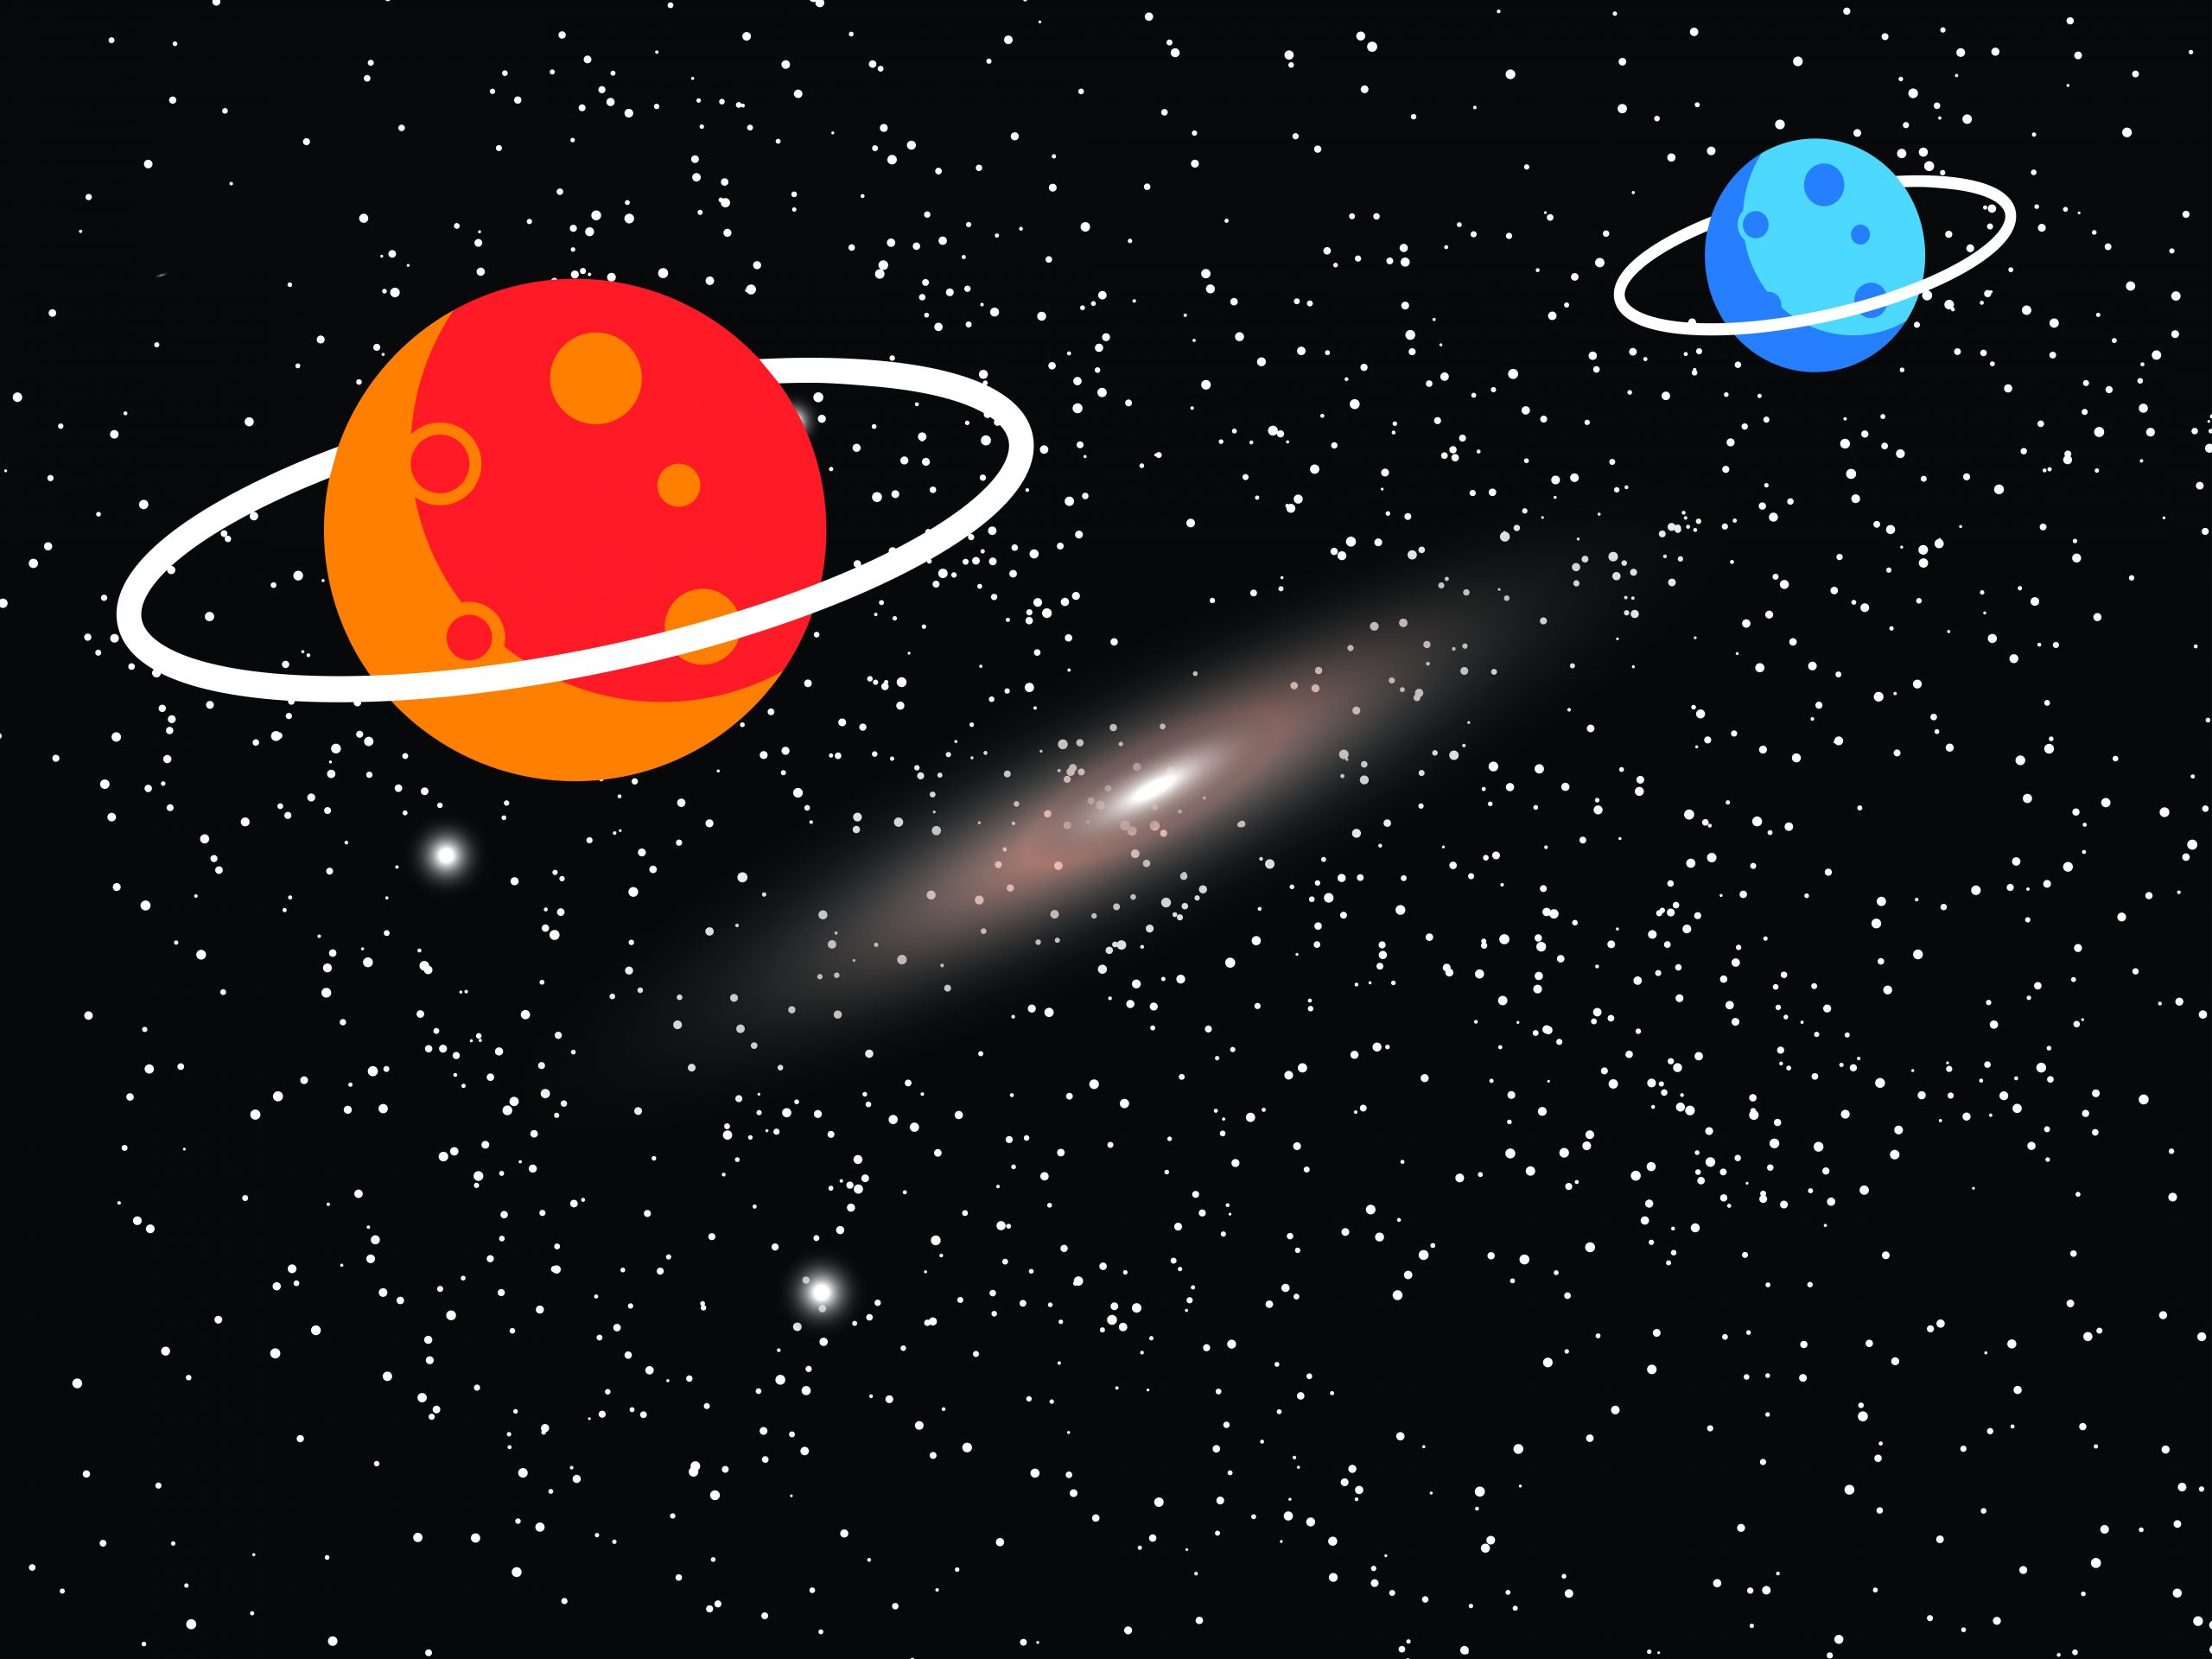 space-illustration